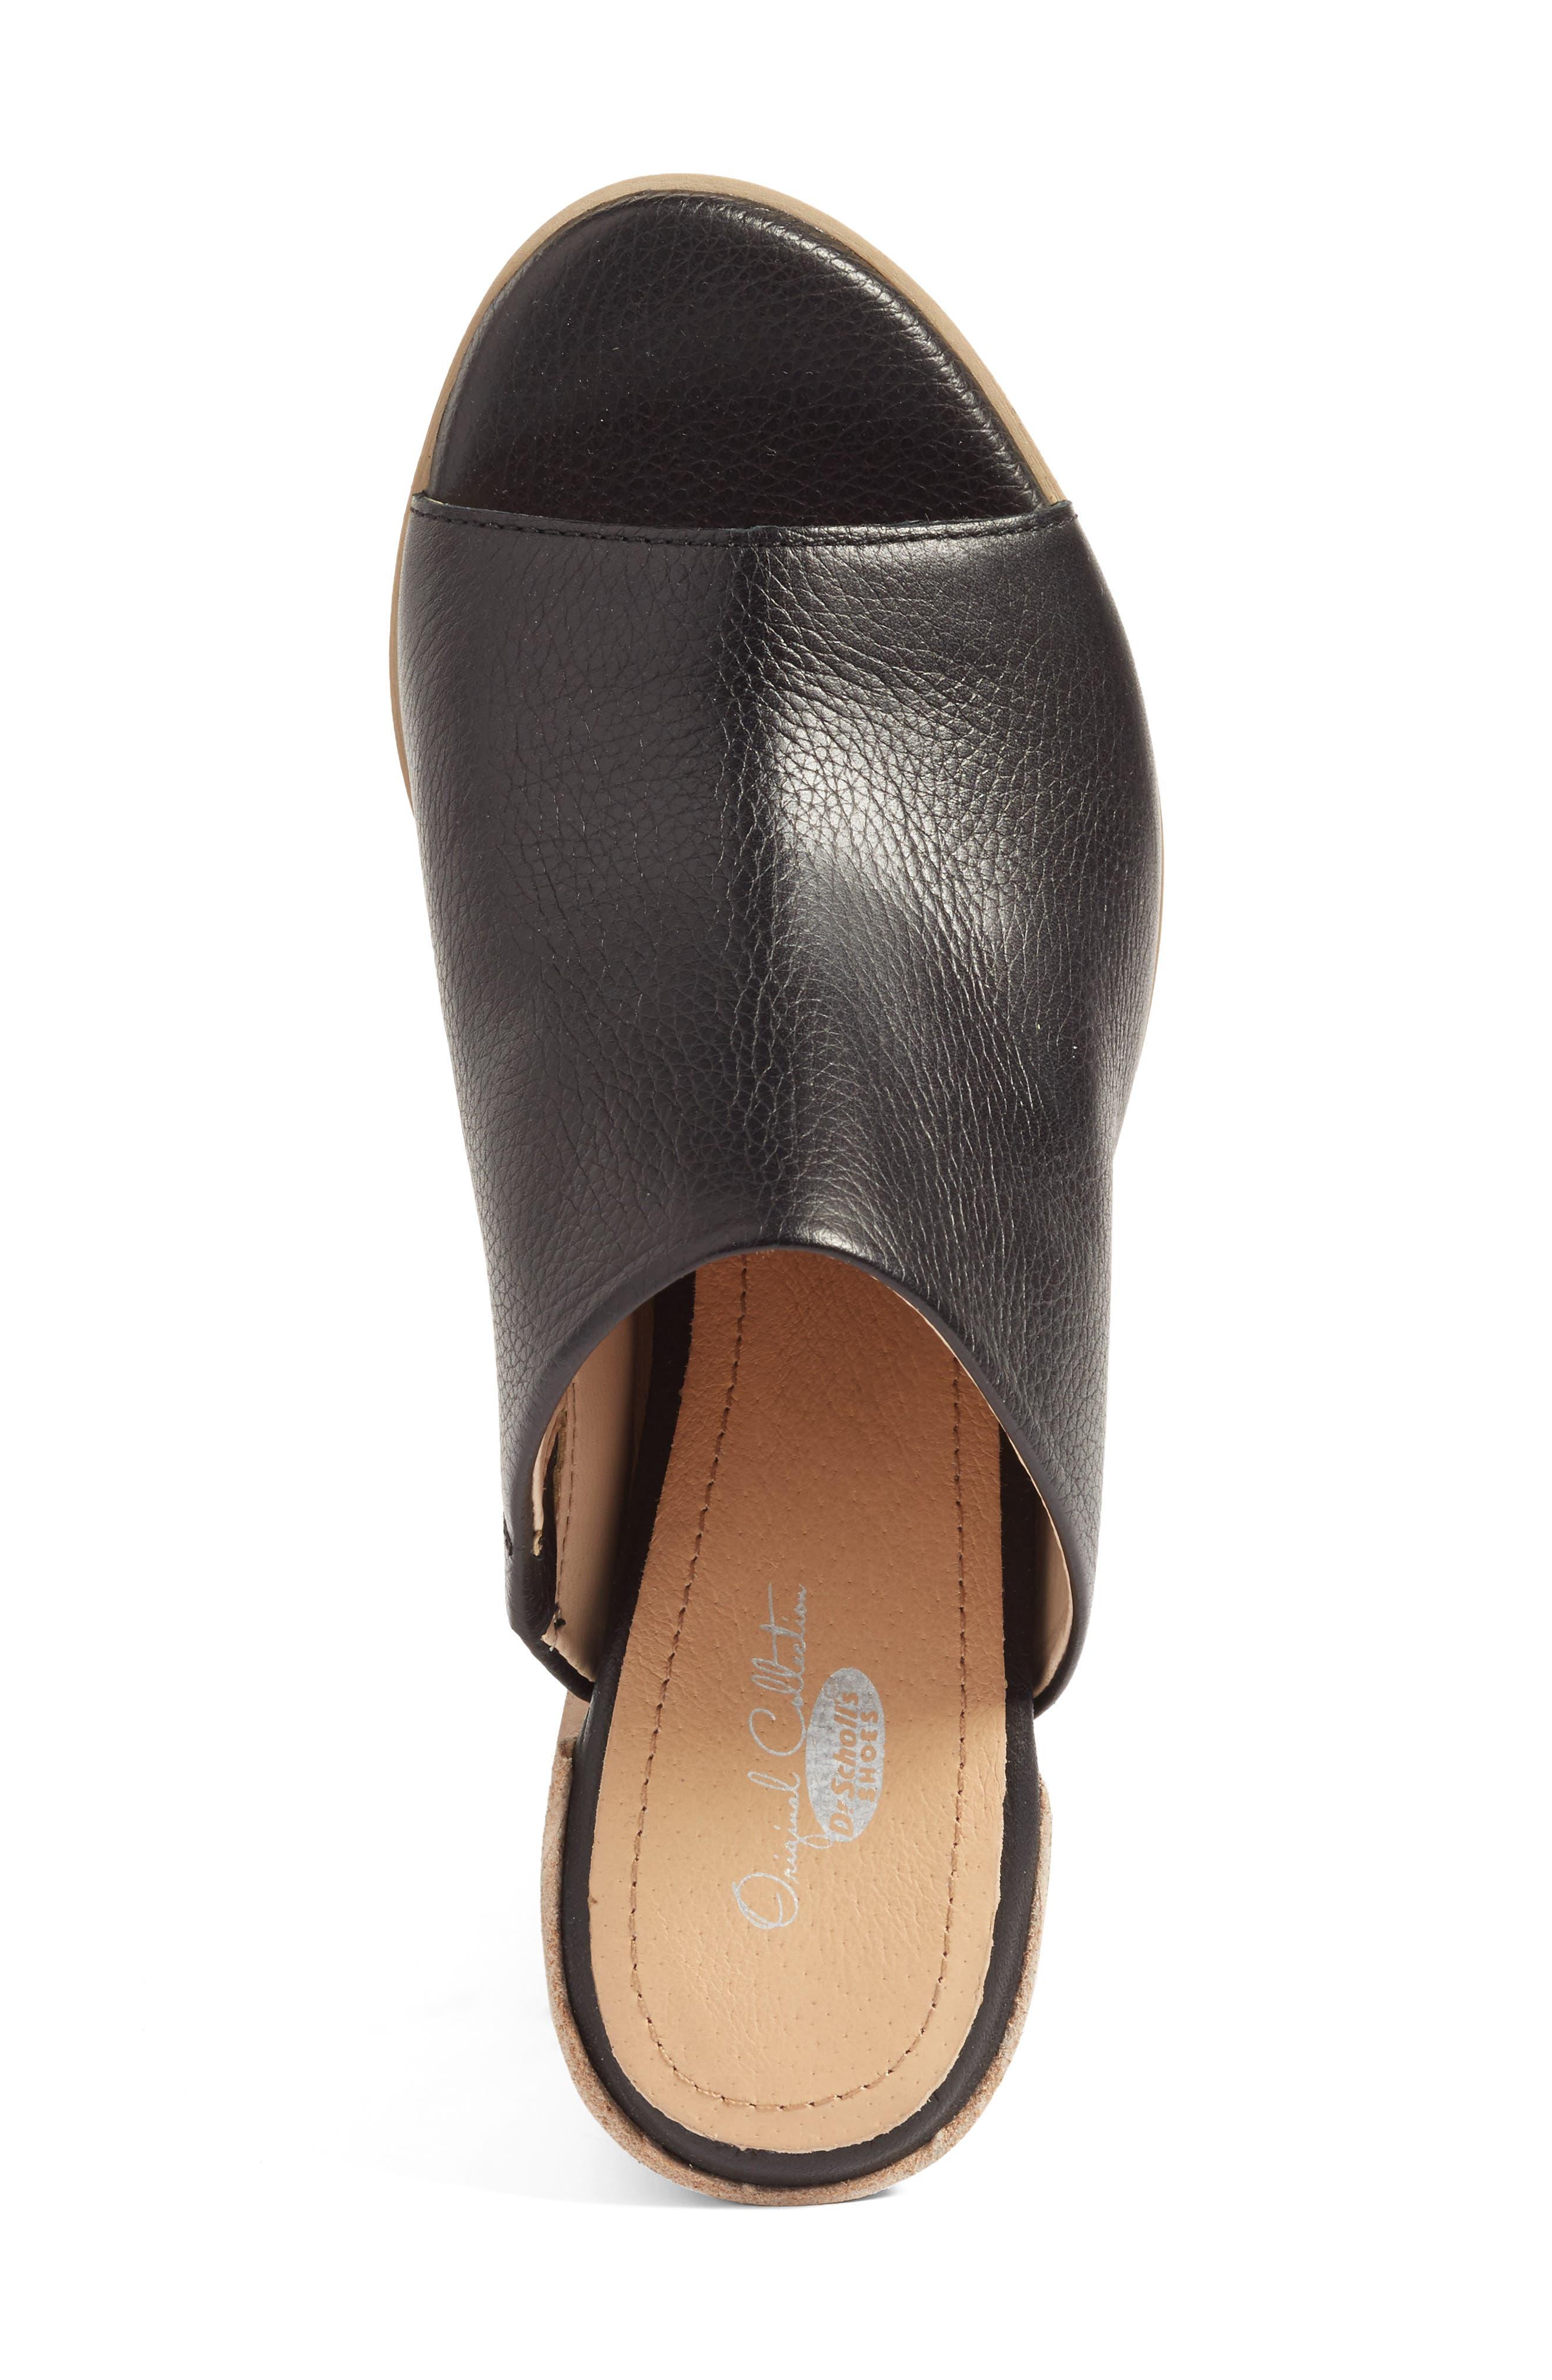 Malin Block Heel Sandal,                             Alternate thumbnail 3, color,                             001